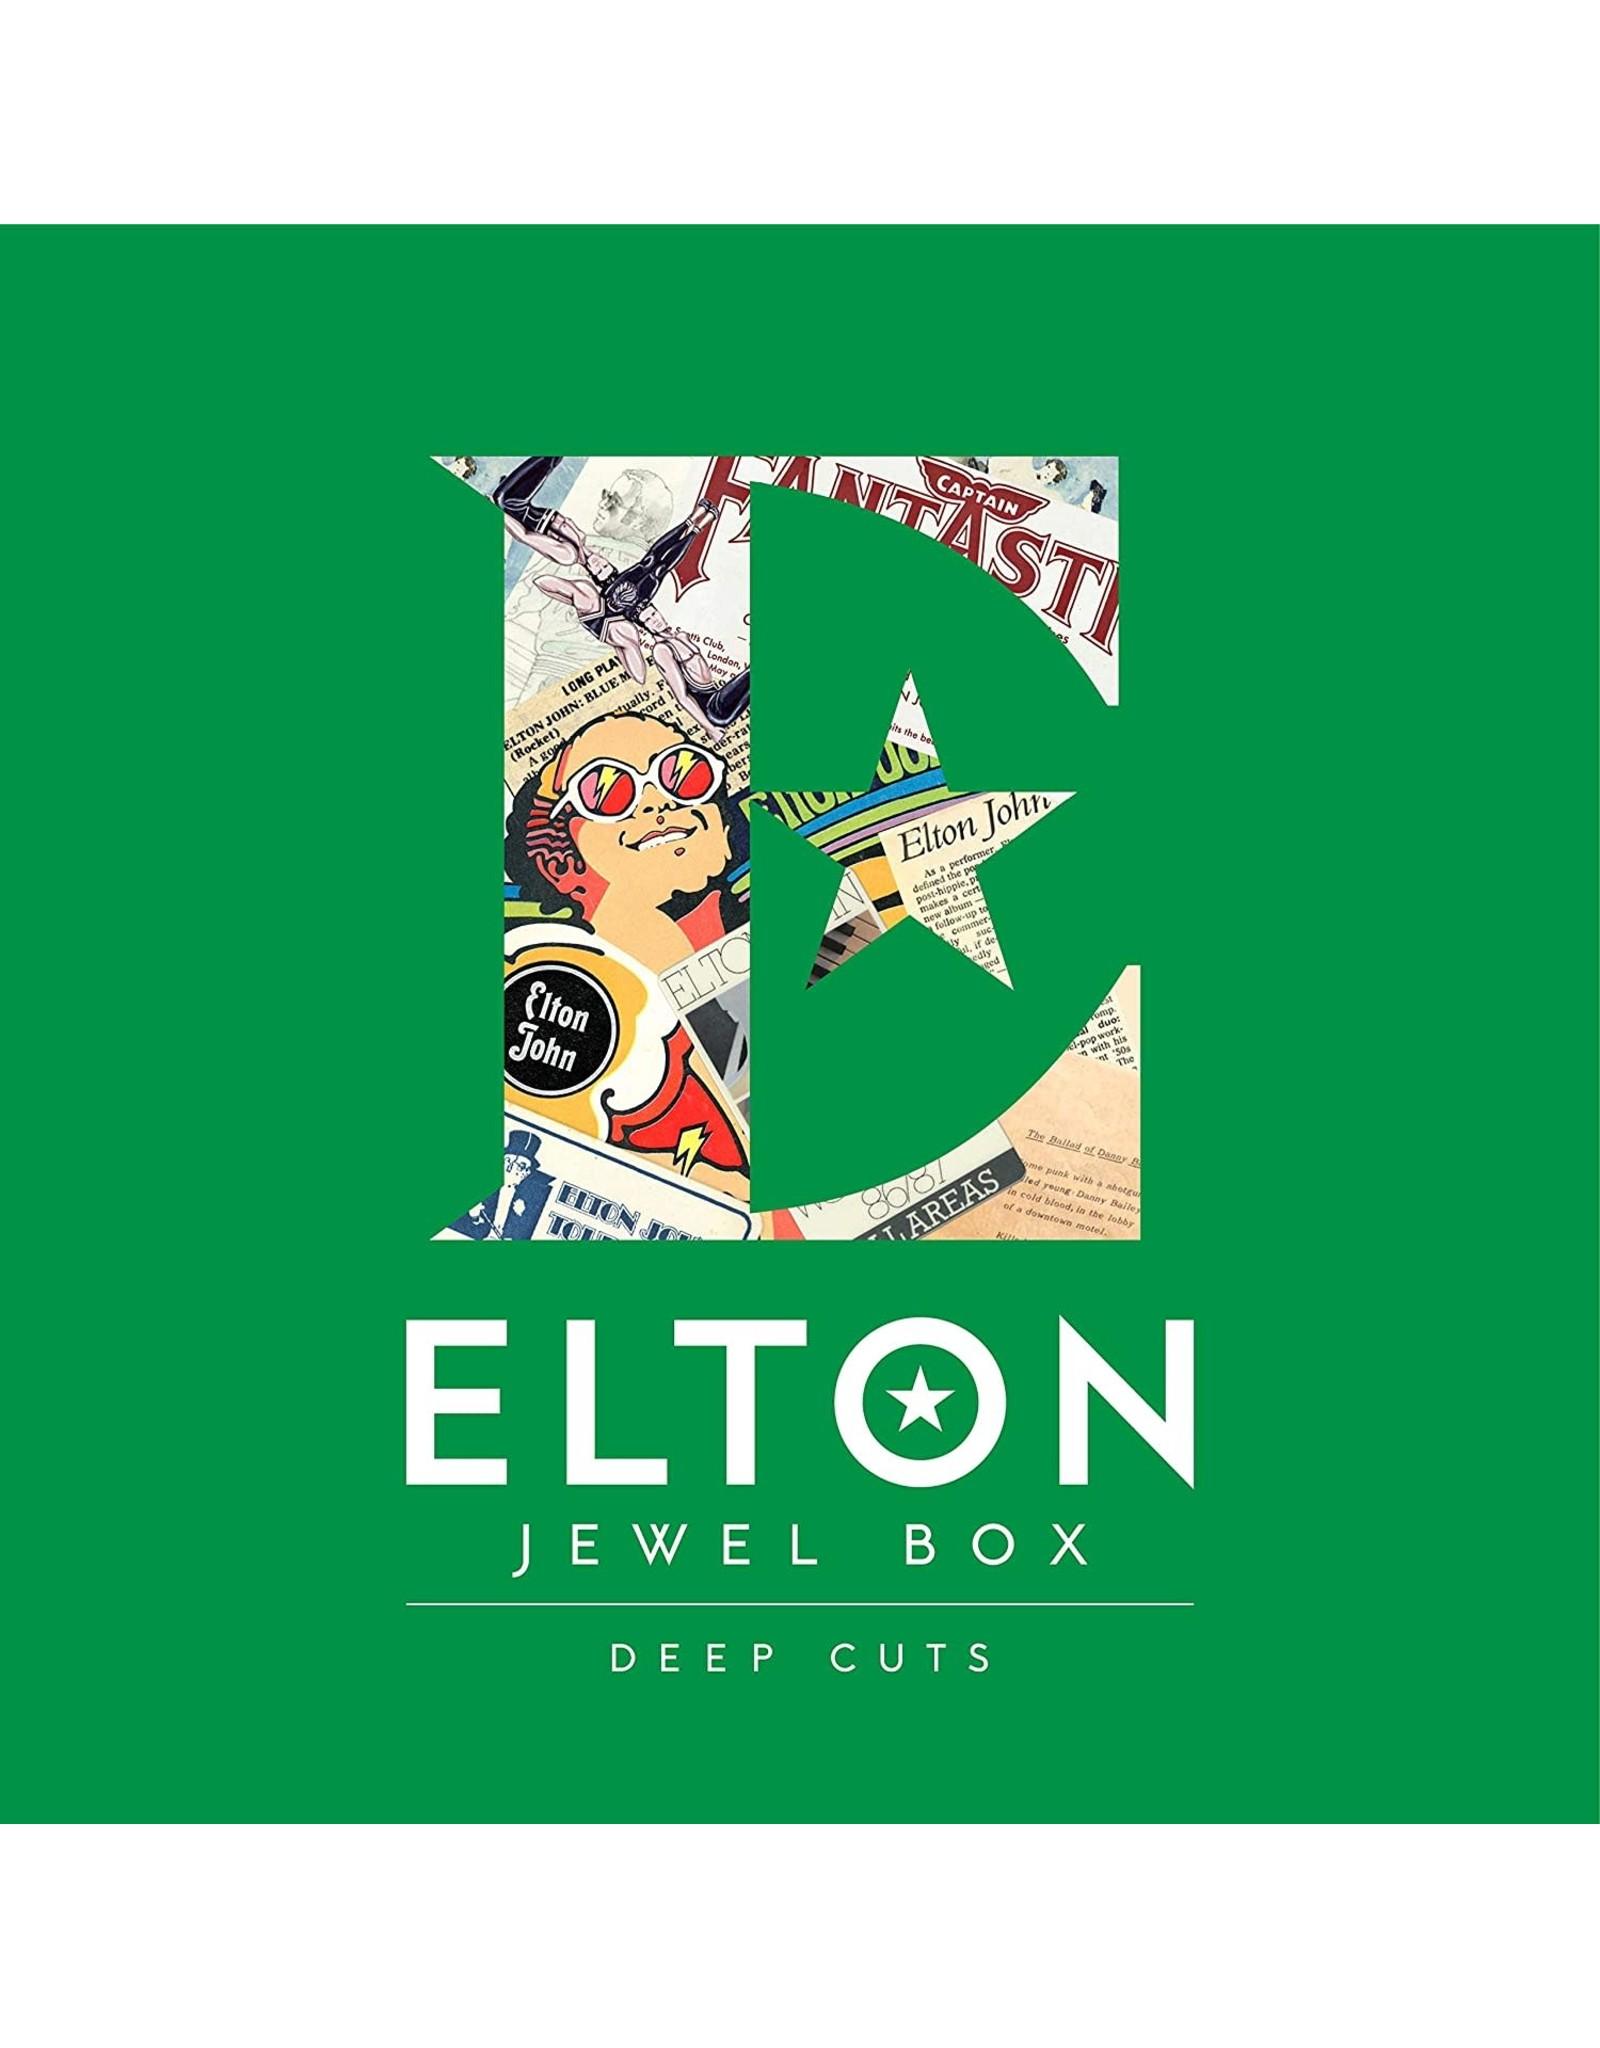 Elton John - Jewel Box: Deep Cuts